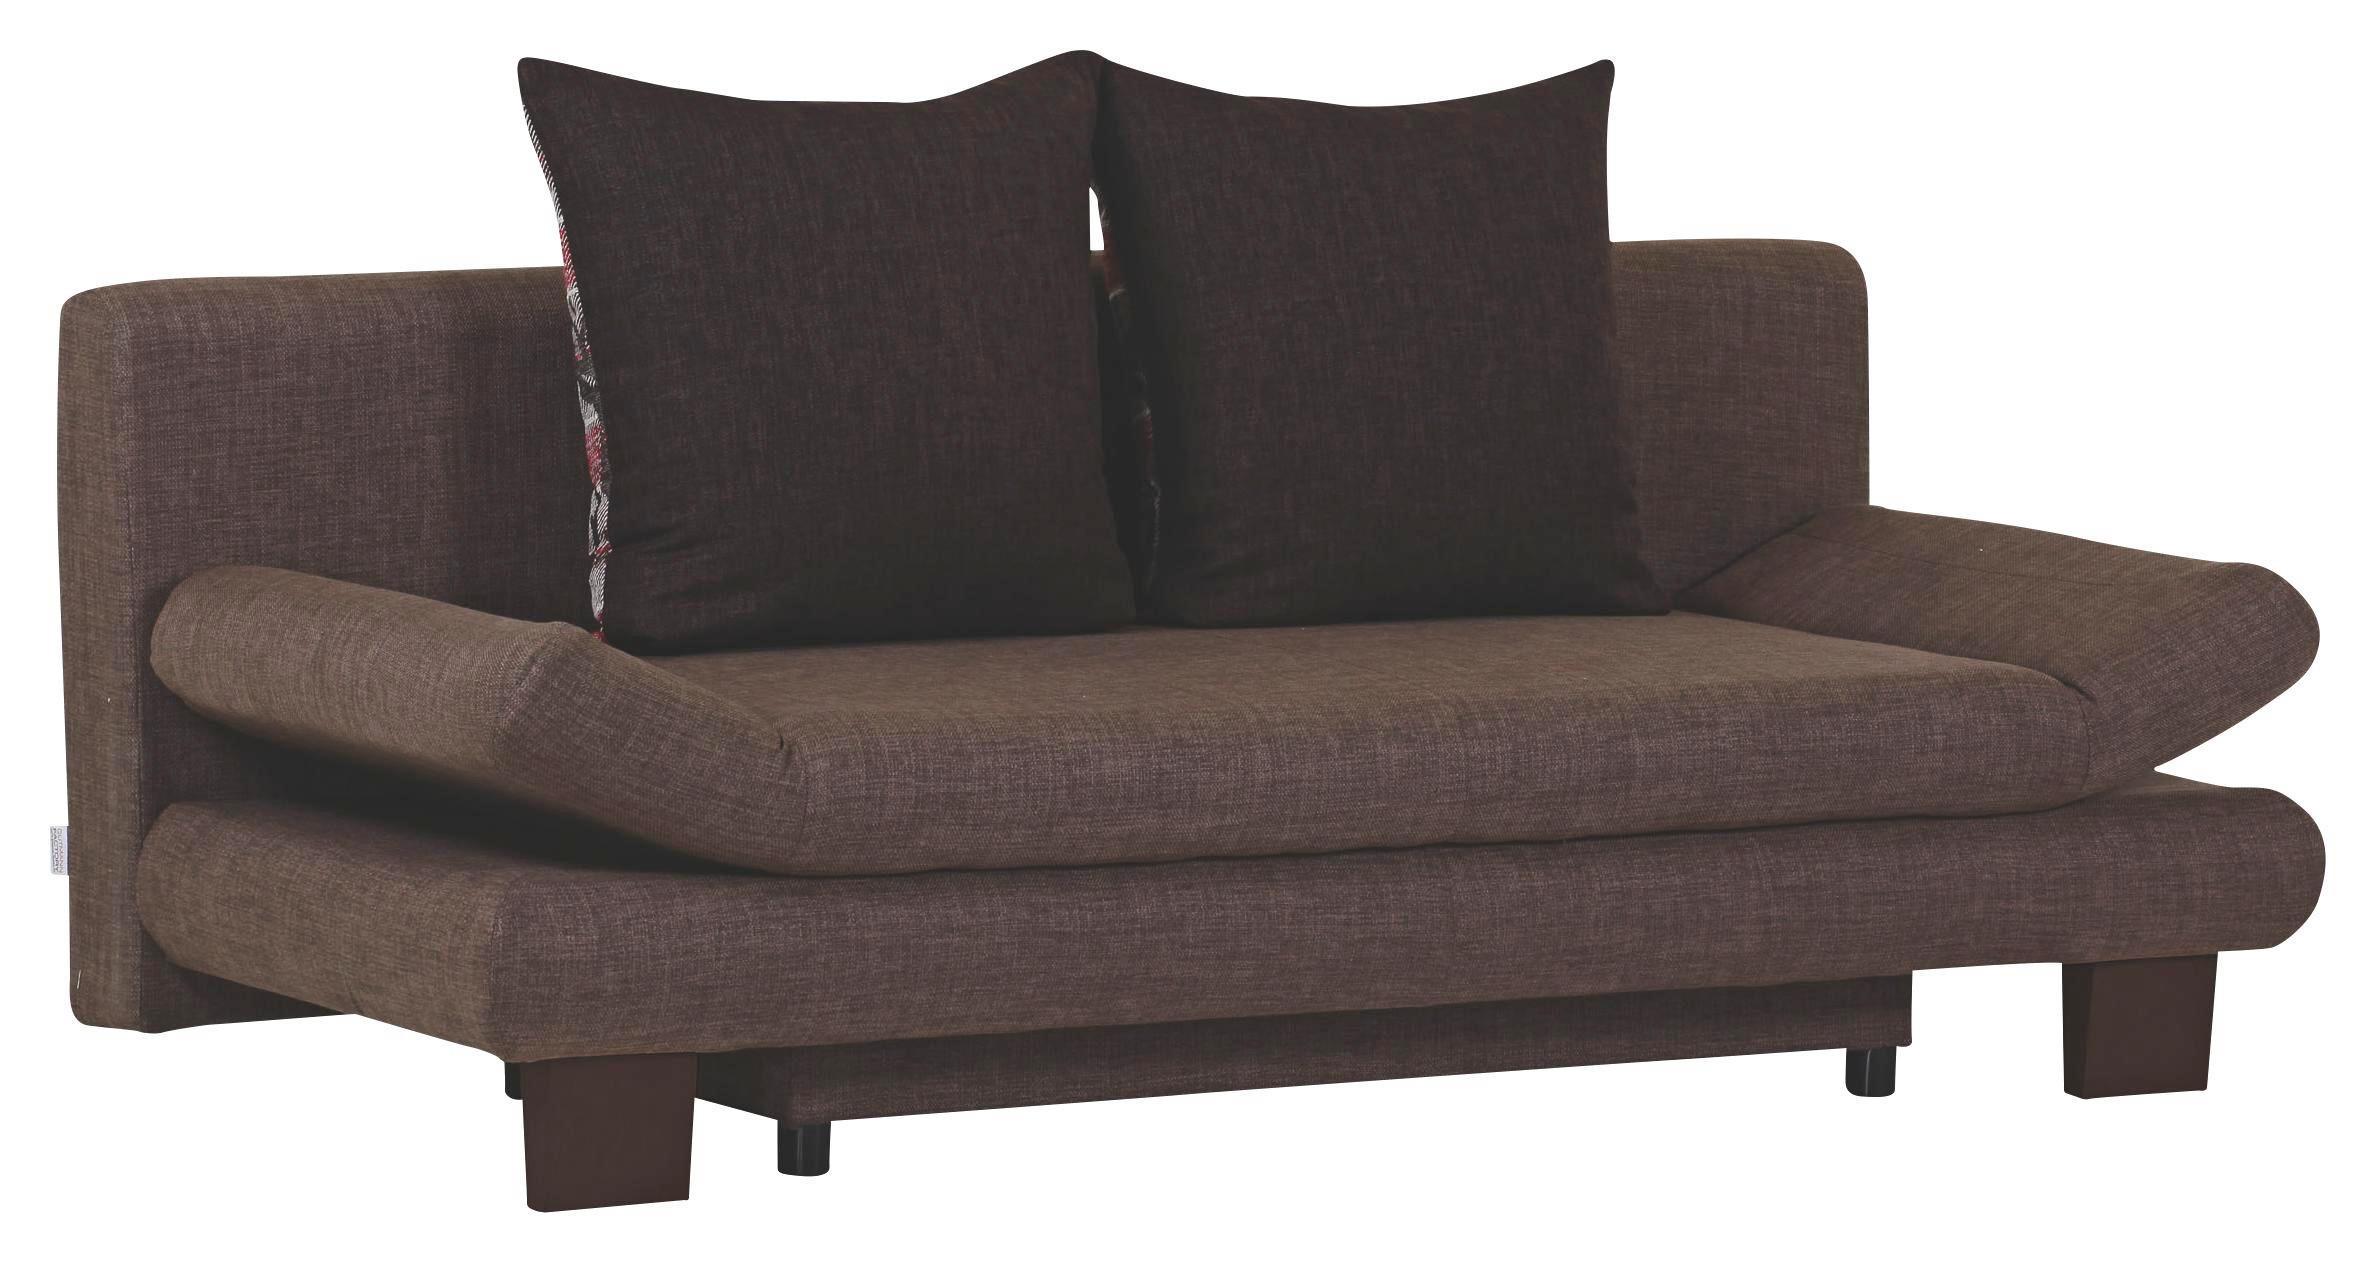 SCHLAFSOFA in Braun Textil - Braun, KONVENTIONELL, Holz/Textil (194/73/91cm) - VENDA